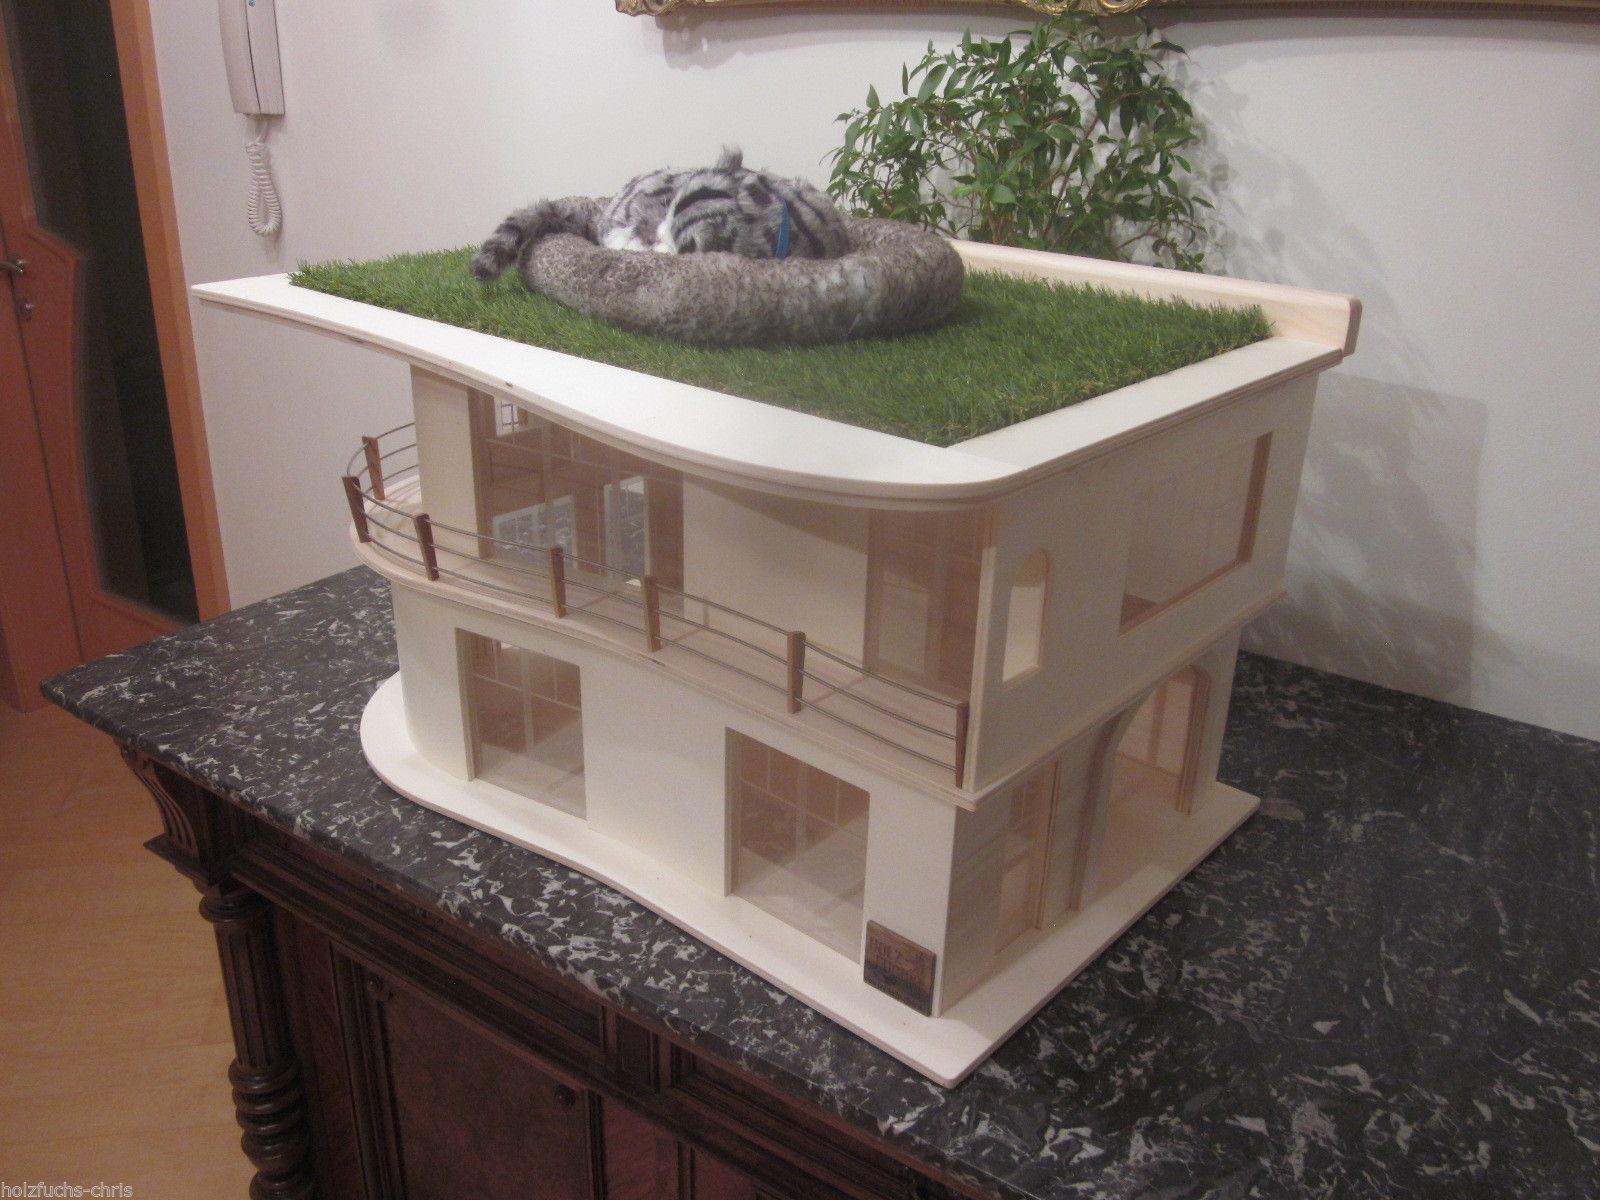 katzenhaus villa bauhaus unlasiert katzen eldorado. Black Bedroom Furniture Sets. Home Design Ideas